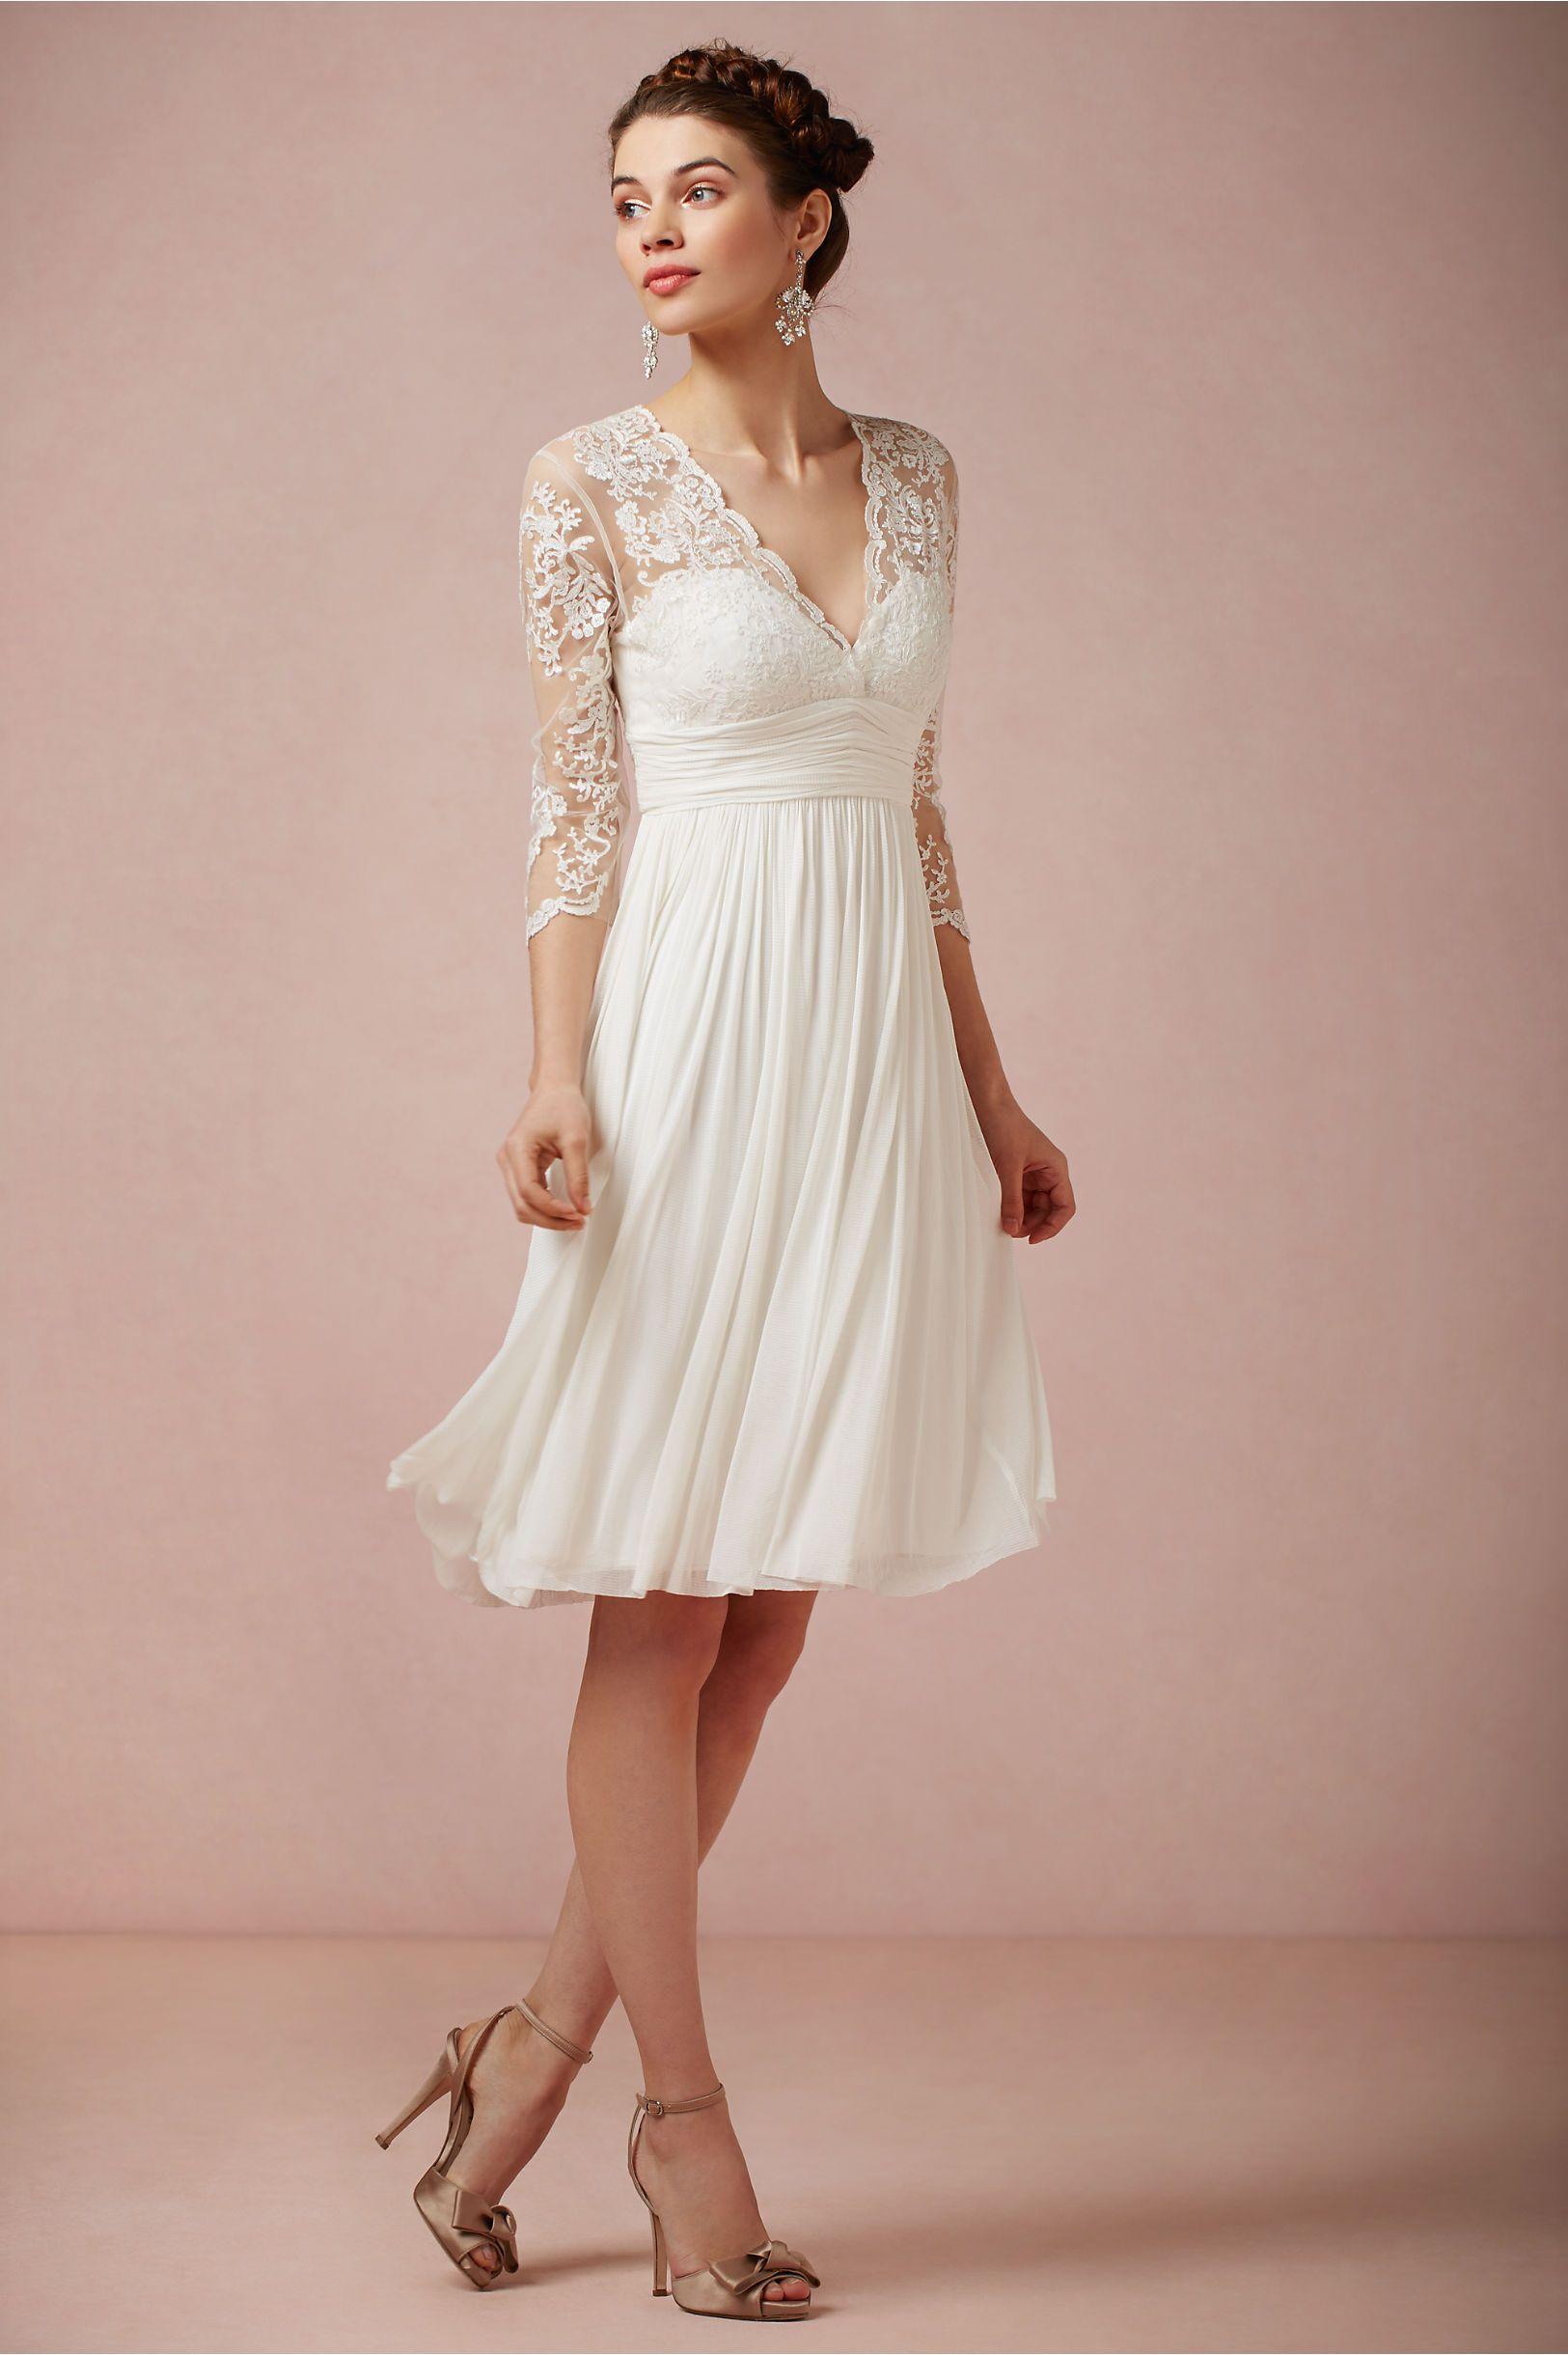 Omari dress in bride wedding dresses at bhldn wedding dress ideas